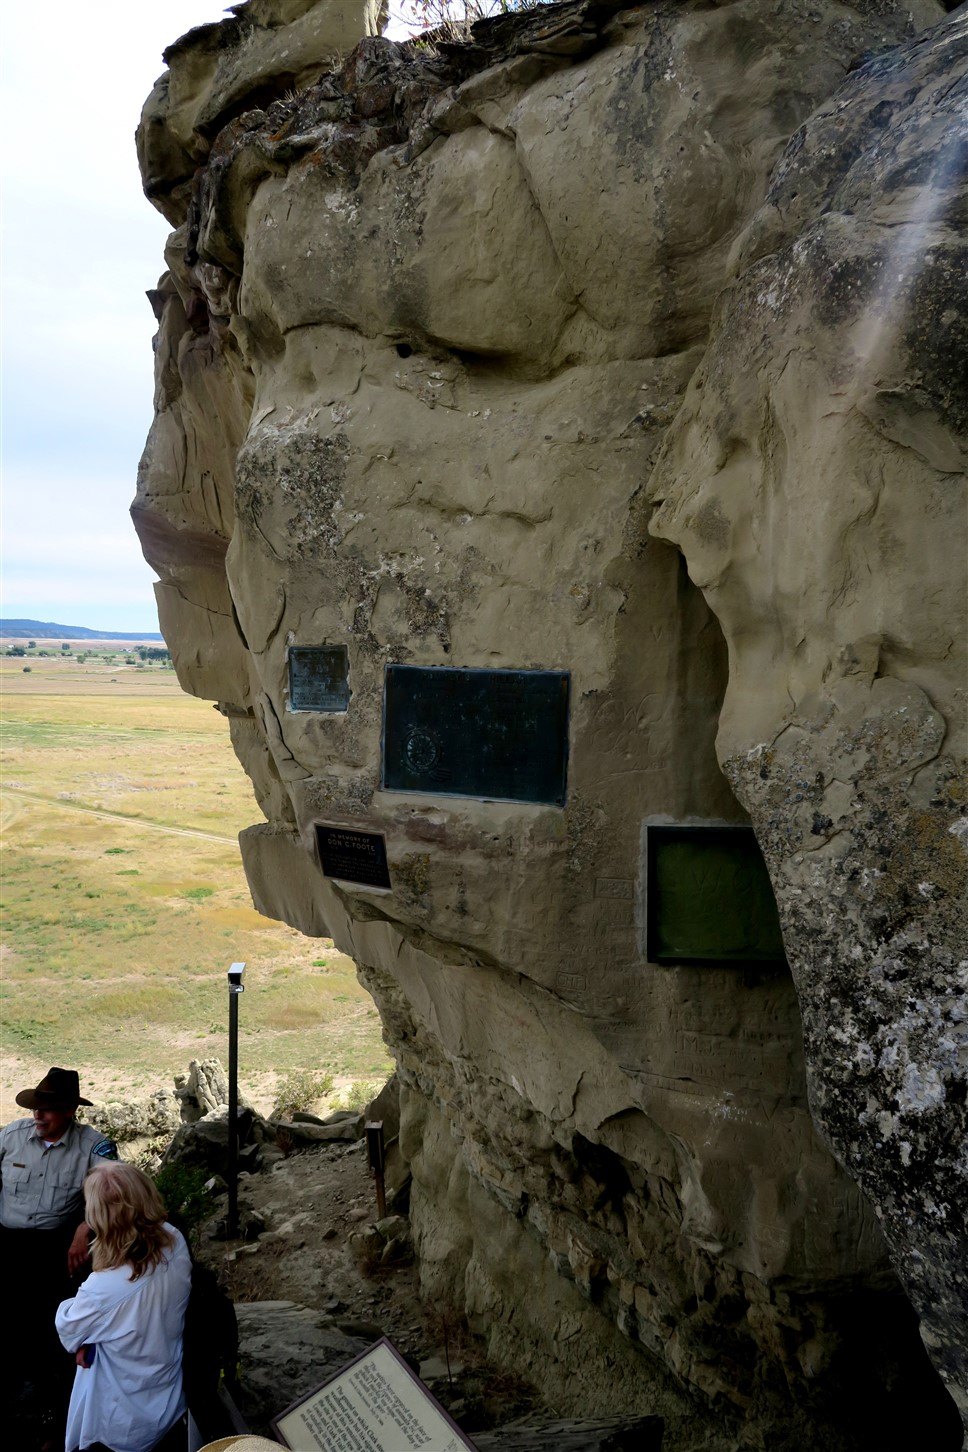 2015 09 09 111 Pompey's Pillar National Monument MT